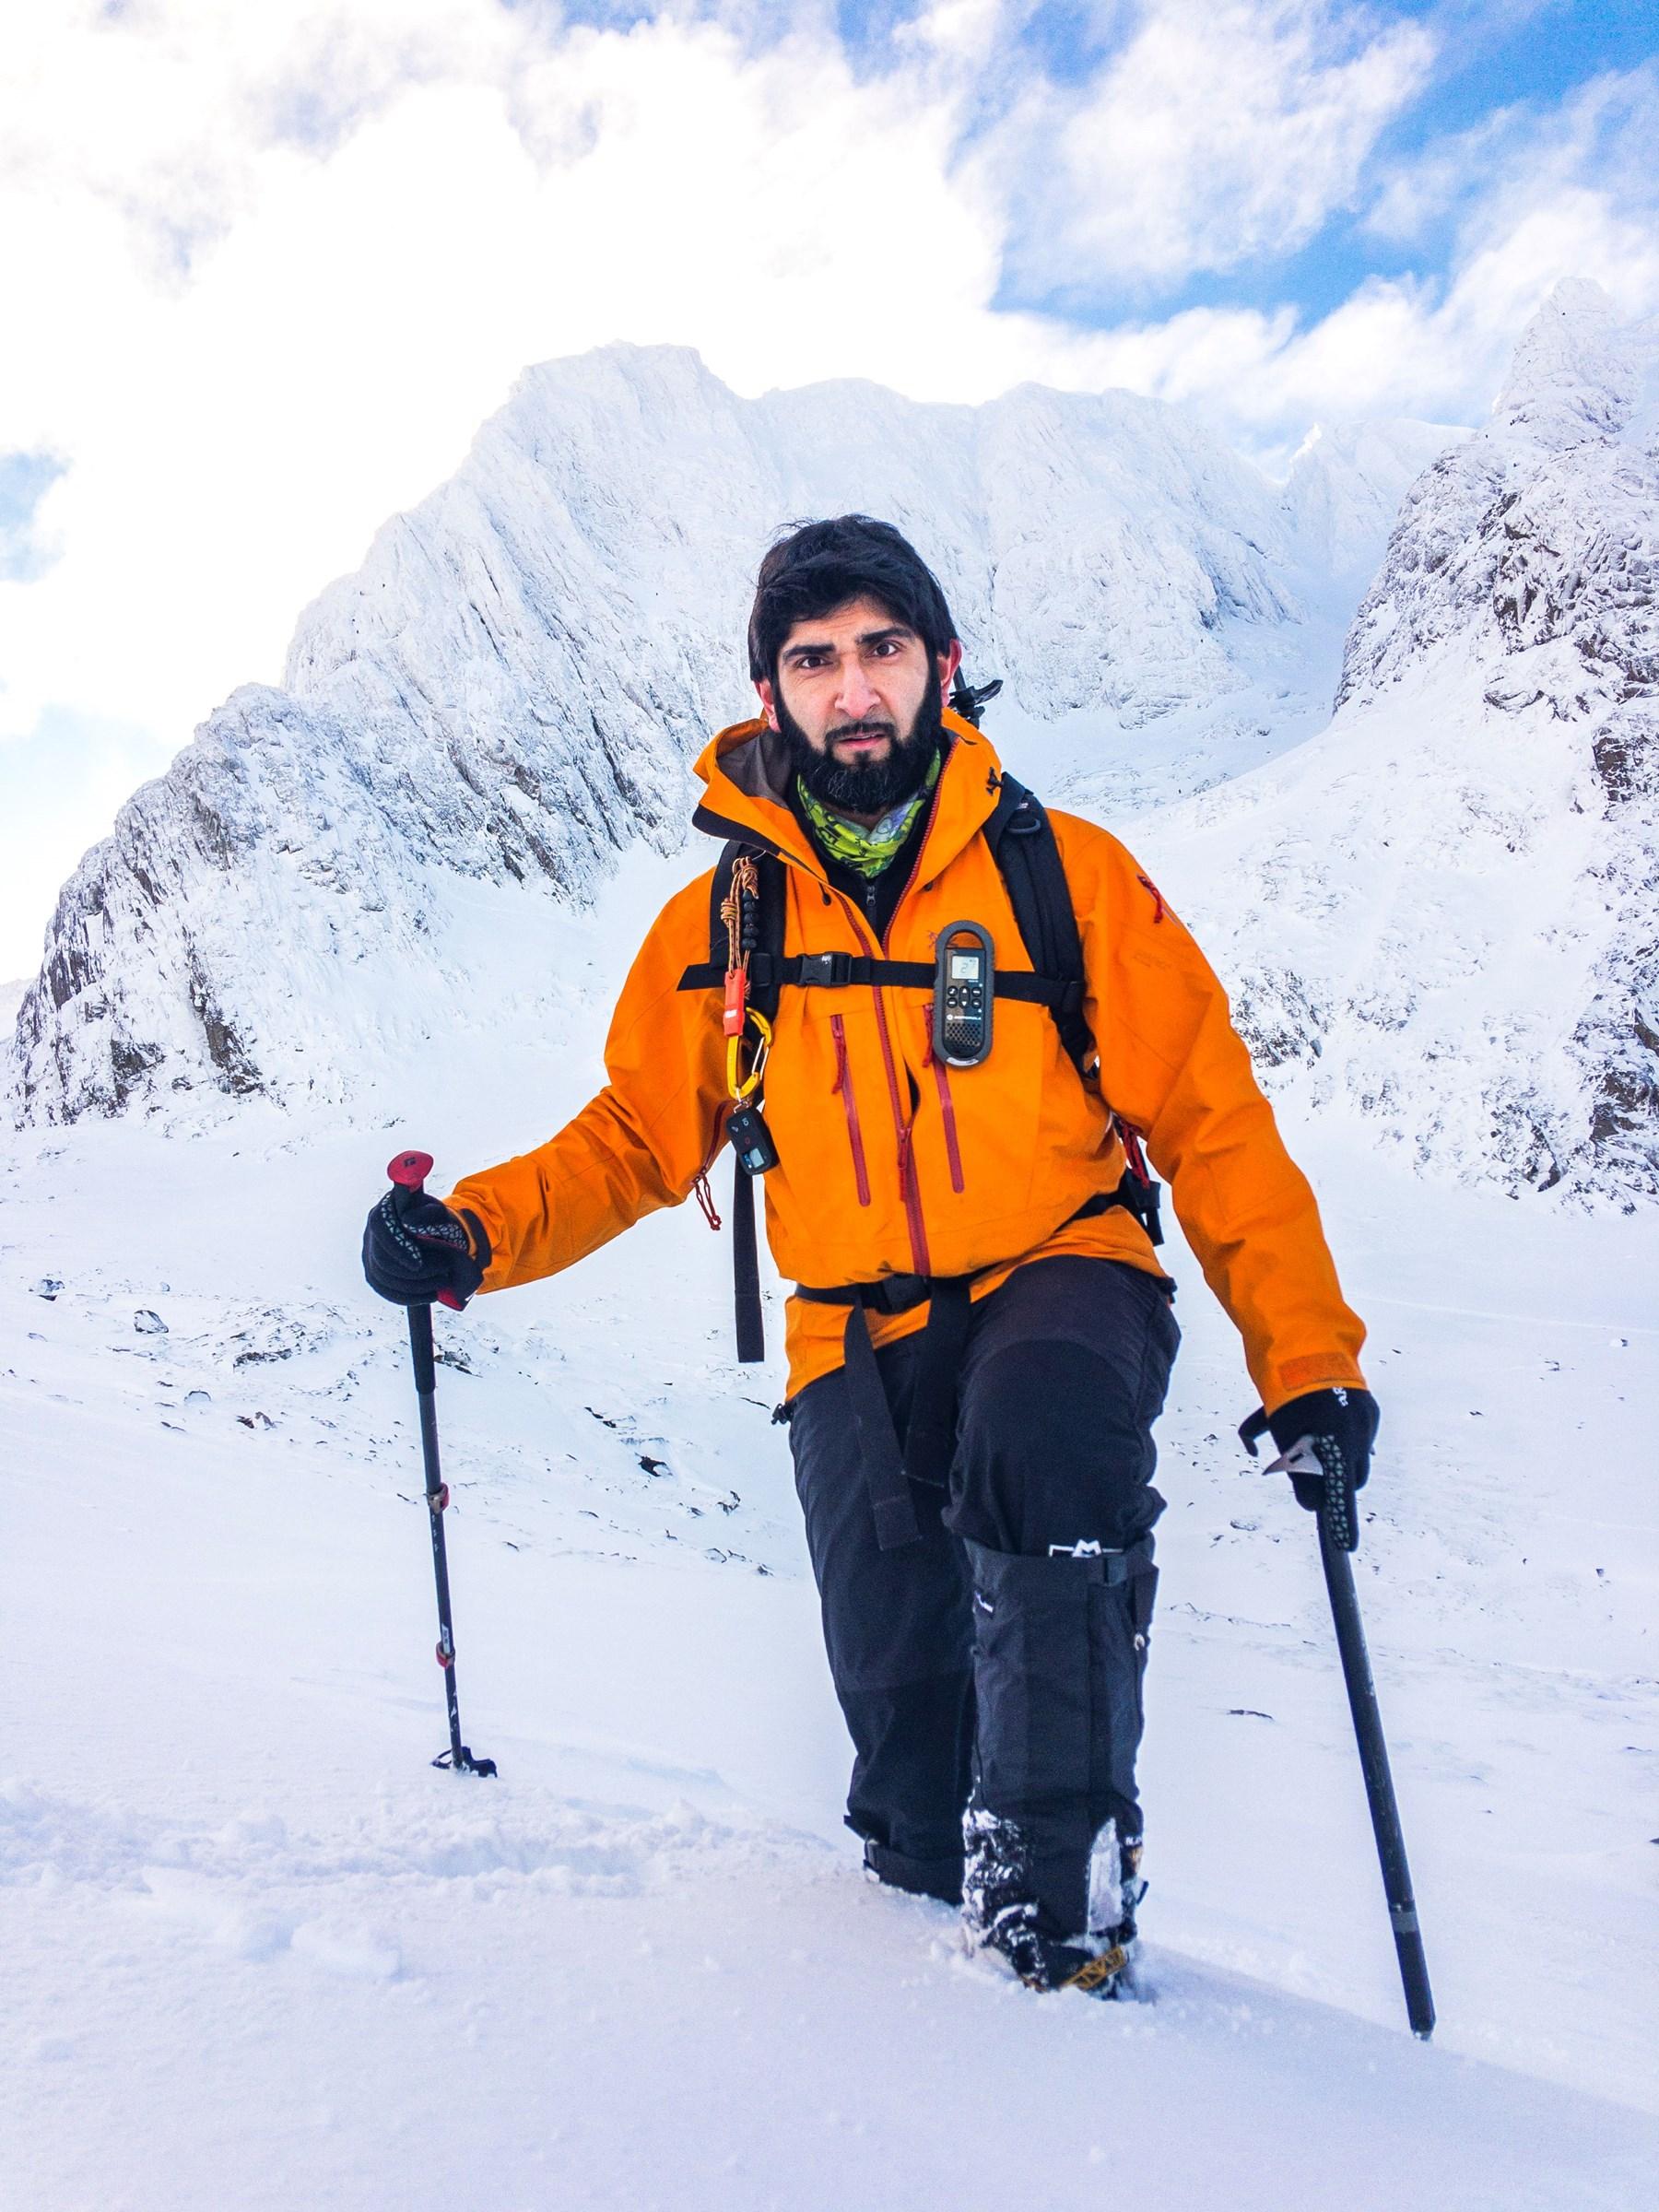 Mahroof Malik climbing mountain in the snow